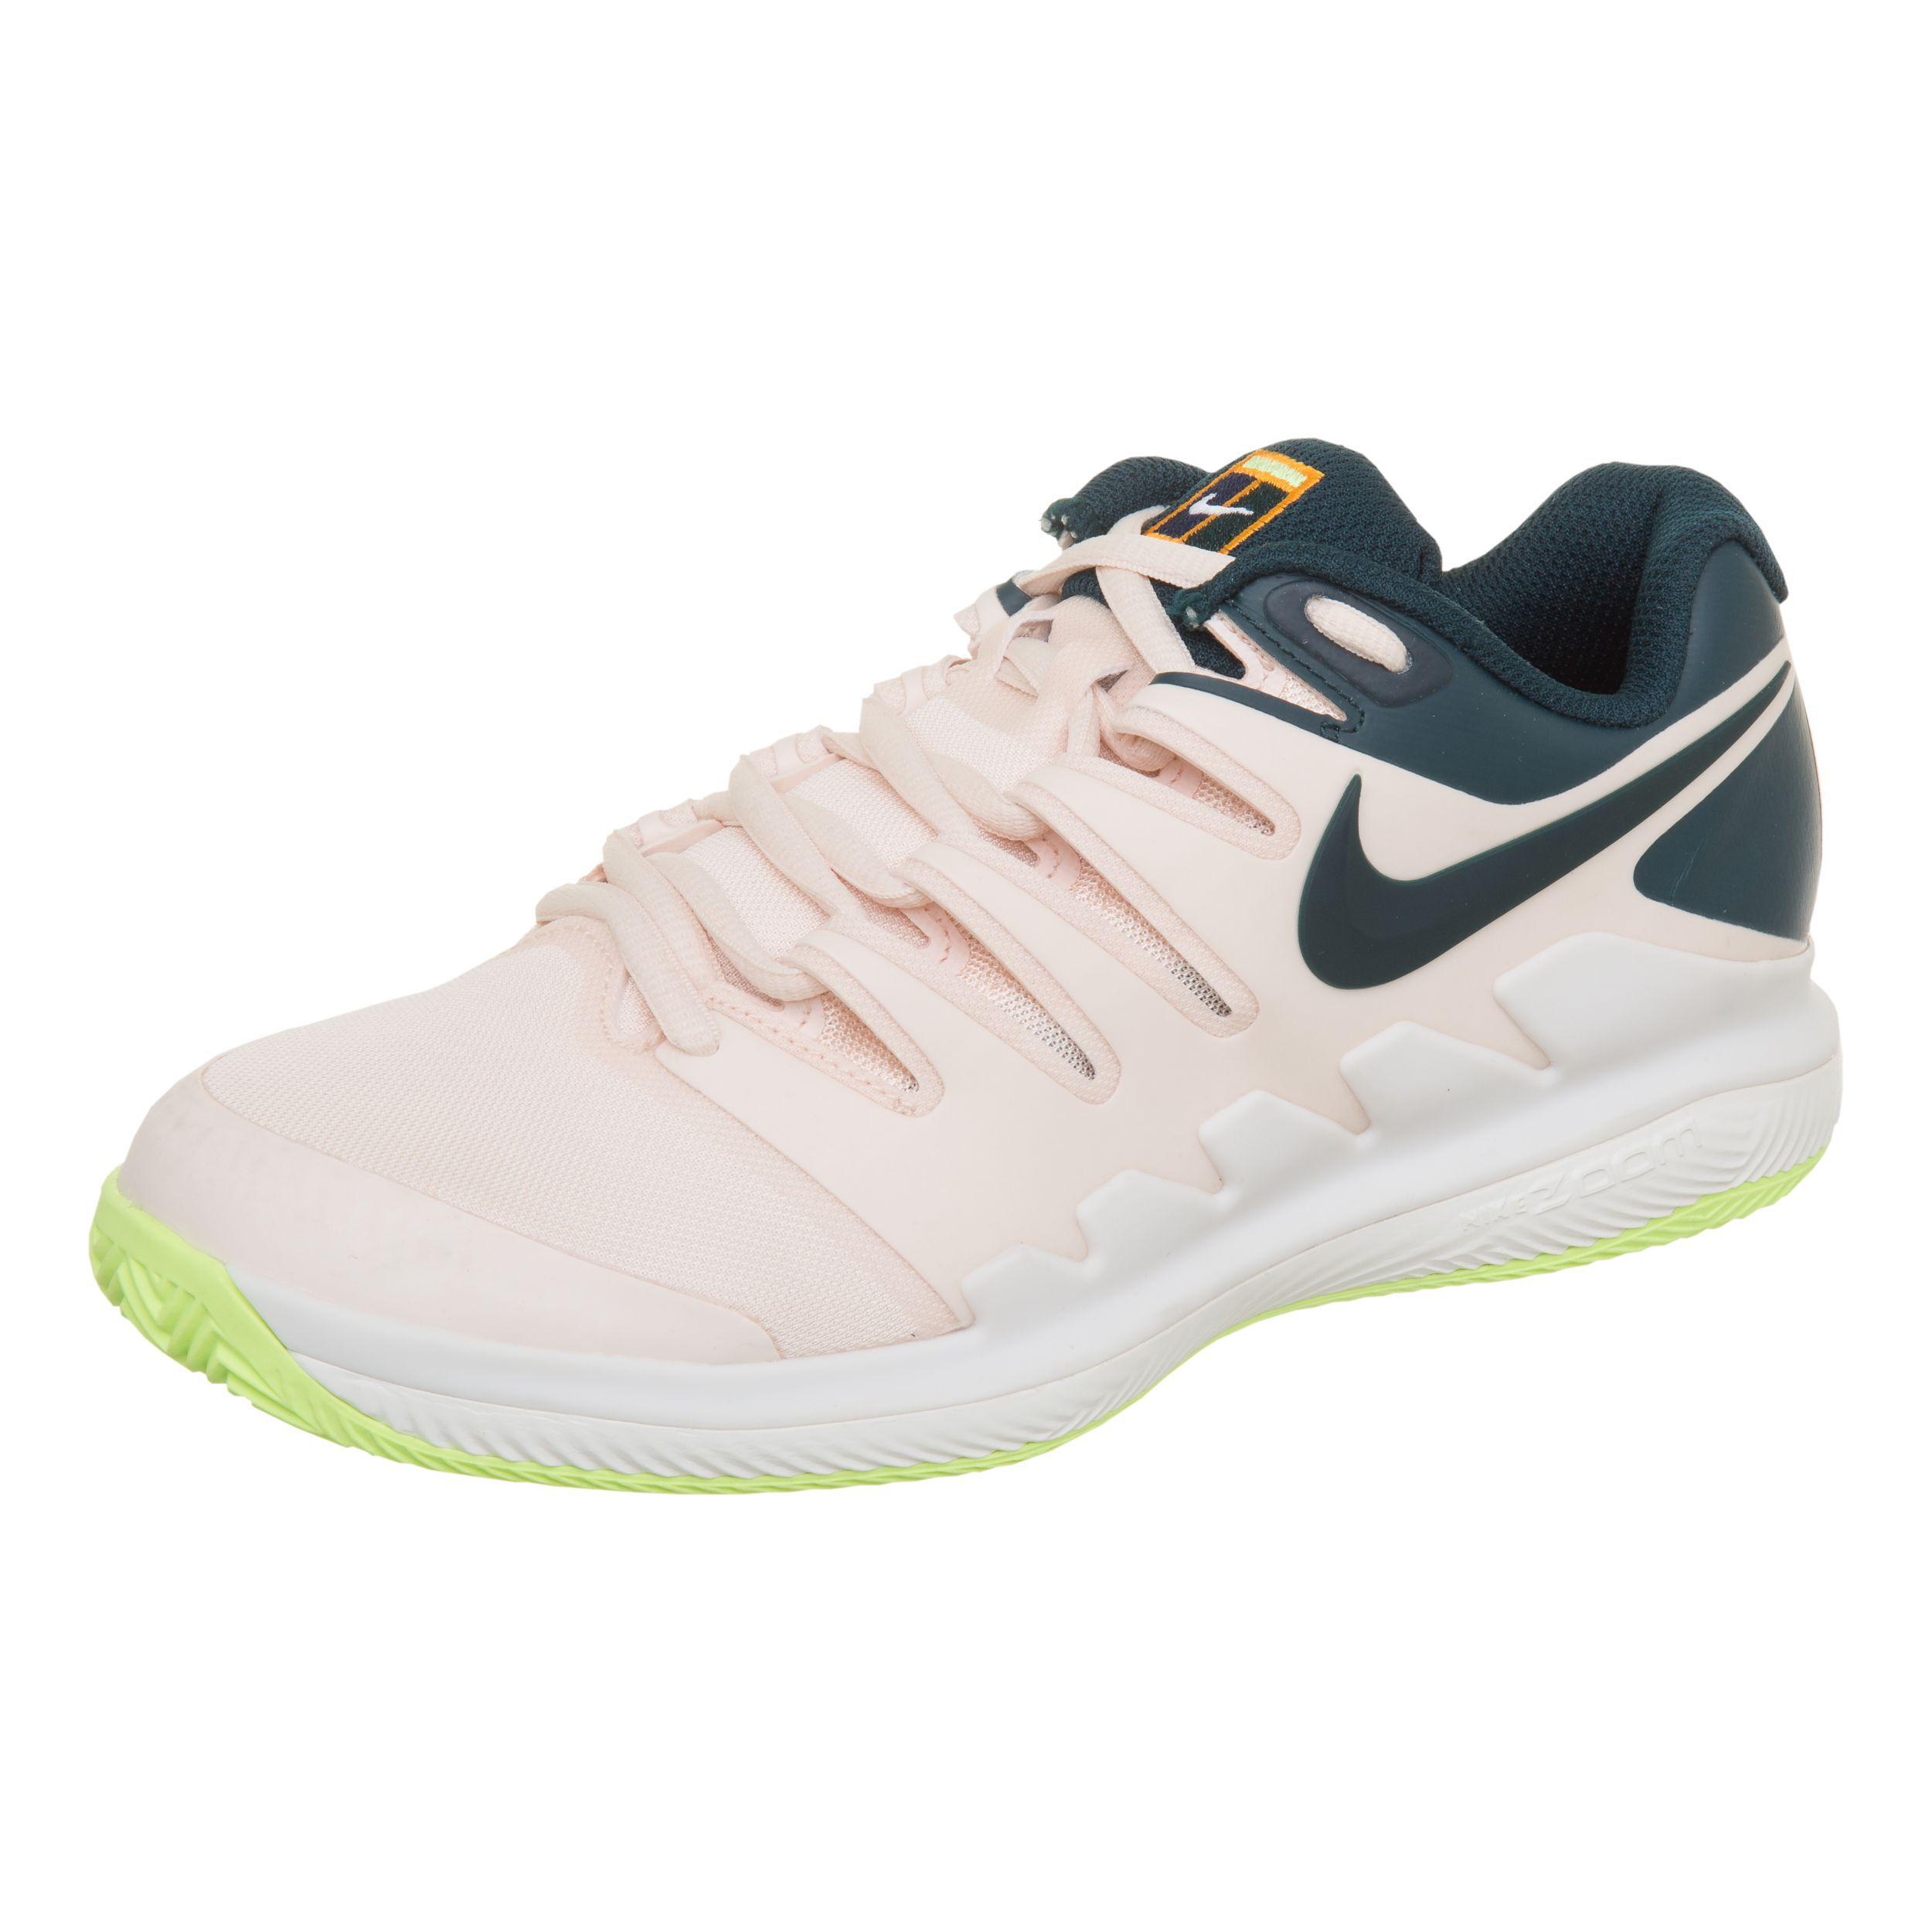 Nike Air Zoom Vapor X Clay Scarpa Per Terra Rossa Donna